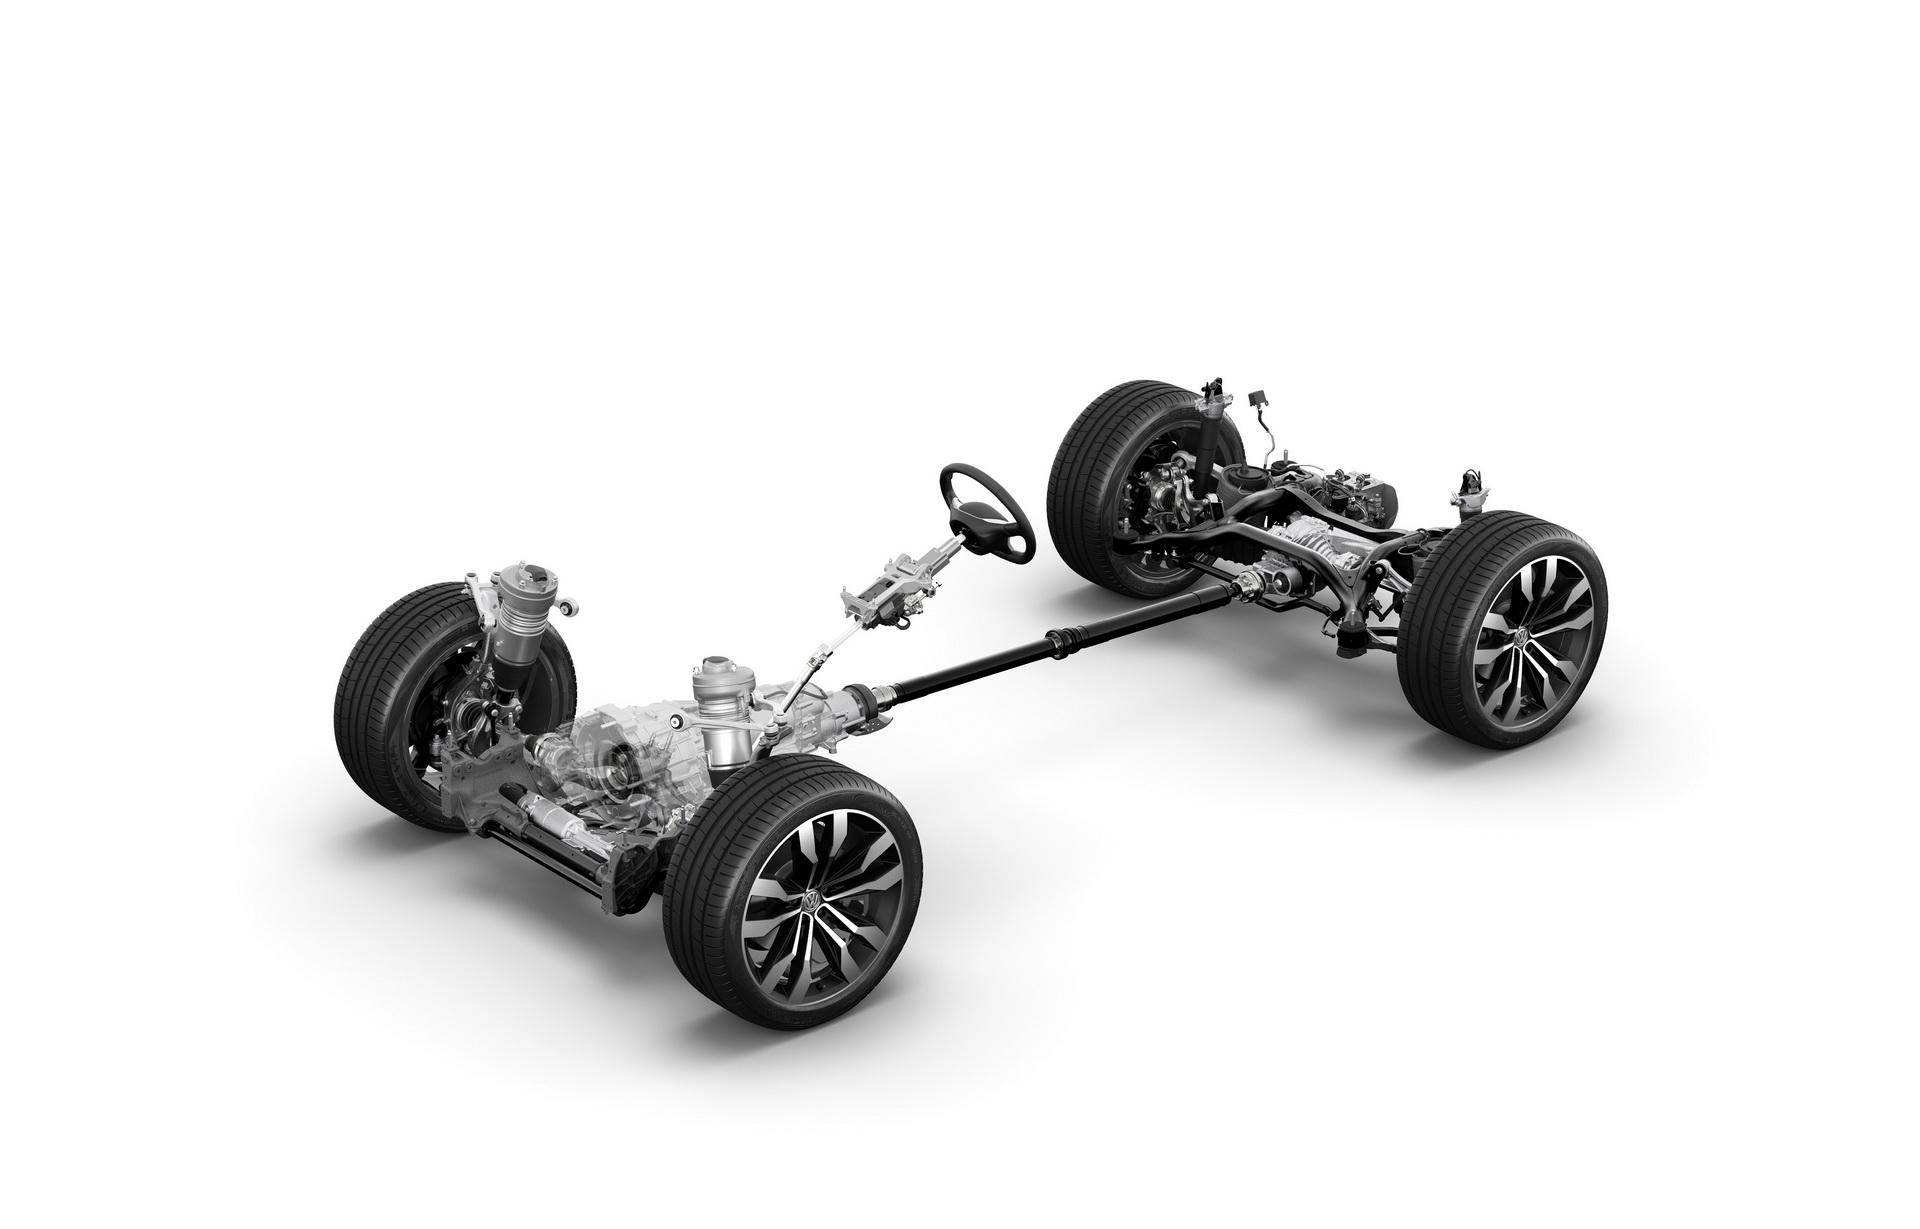 Volkswagen Touareg 2018 (48)